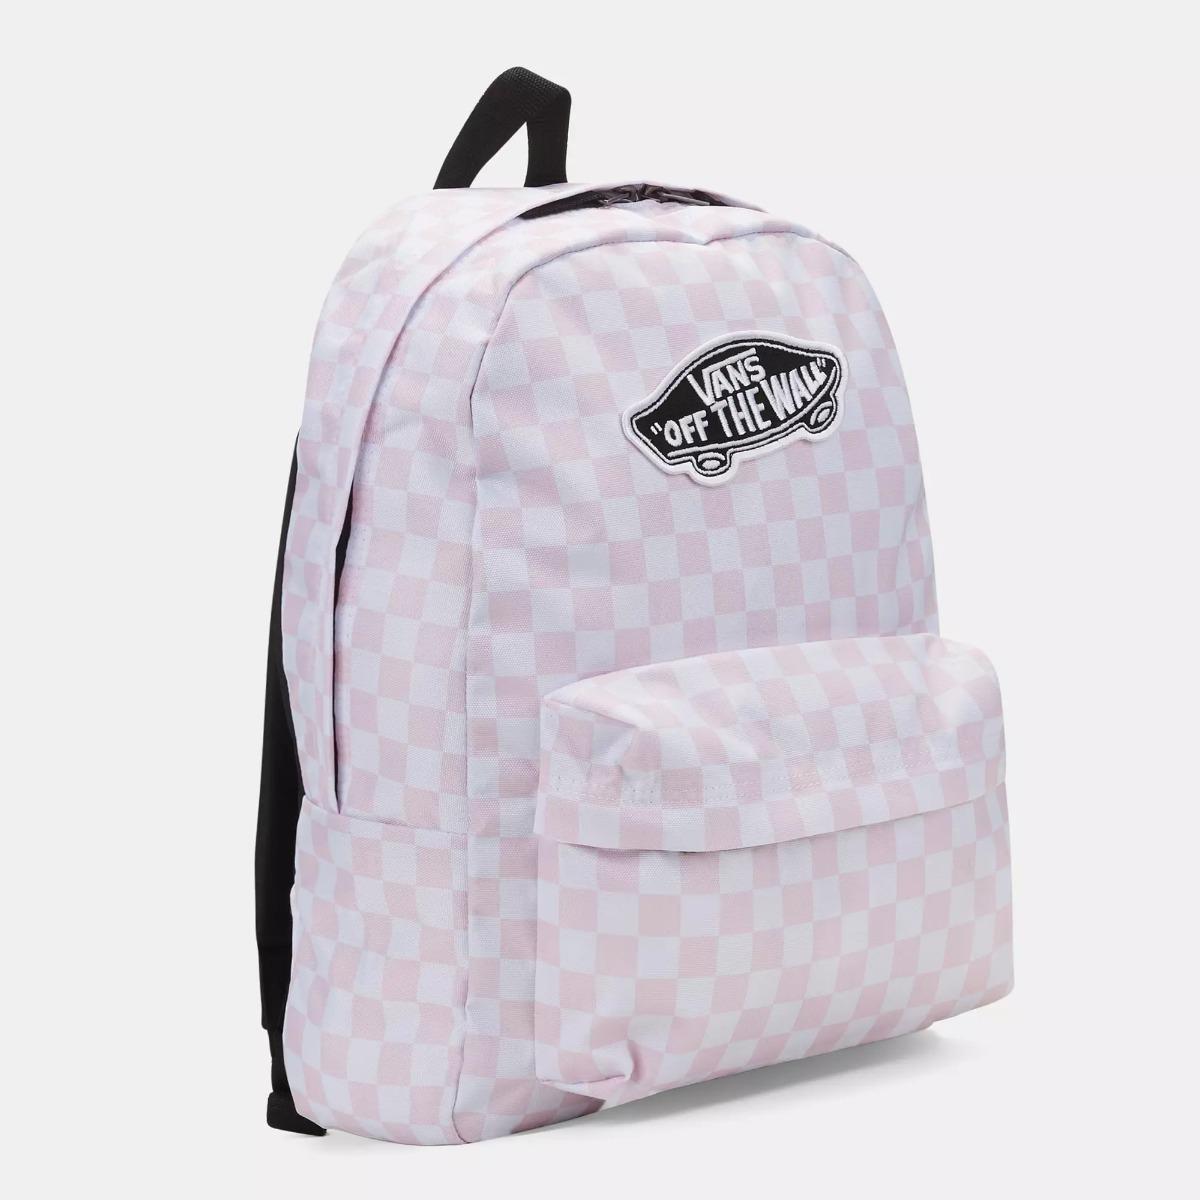 732d0872c6c mochila vans skate escolar laptop realm clasica ajedrez 22l. Cargando zoom.